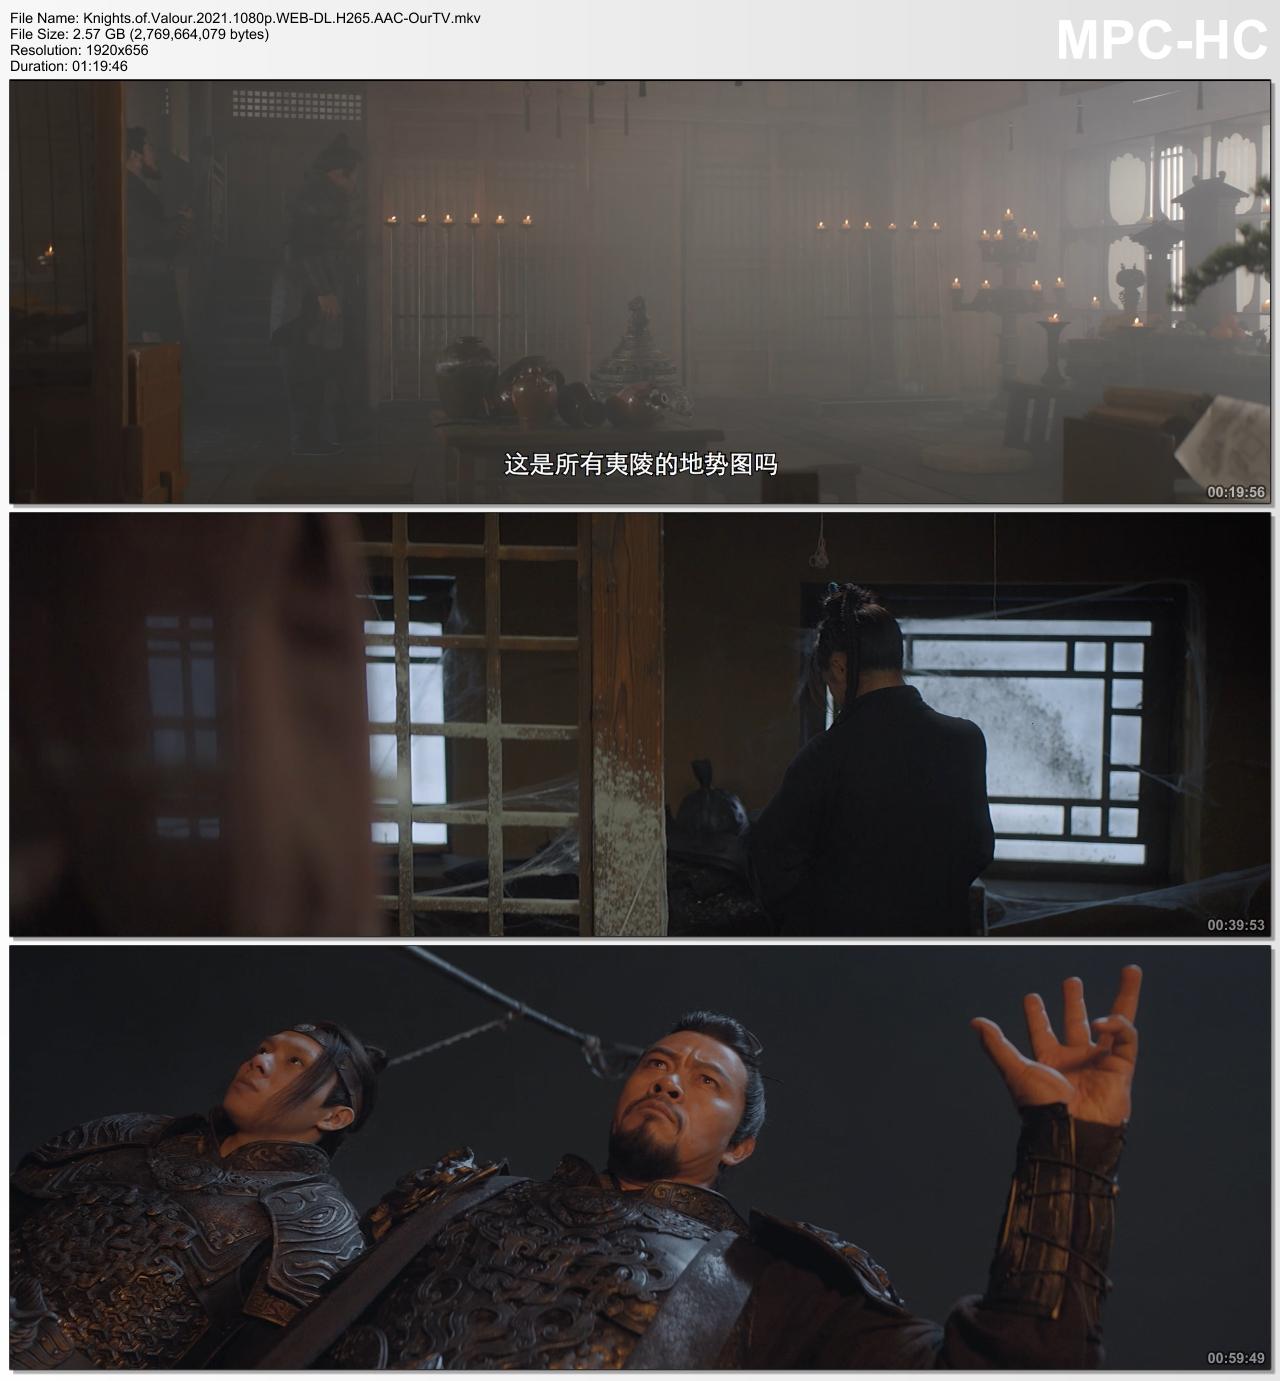 Thanh Long Yến Nguyệt Đao - Knights of Valour 2021 1080p WEB-DL H265 AAC-OurTV screenshots